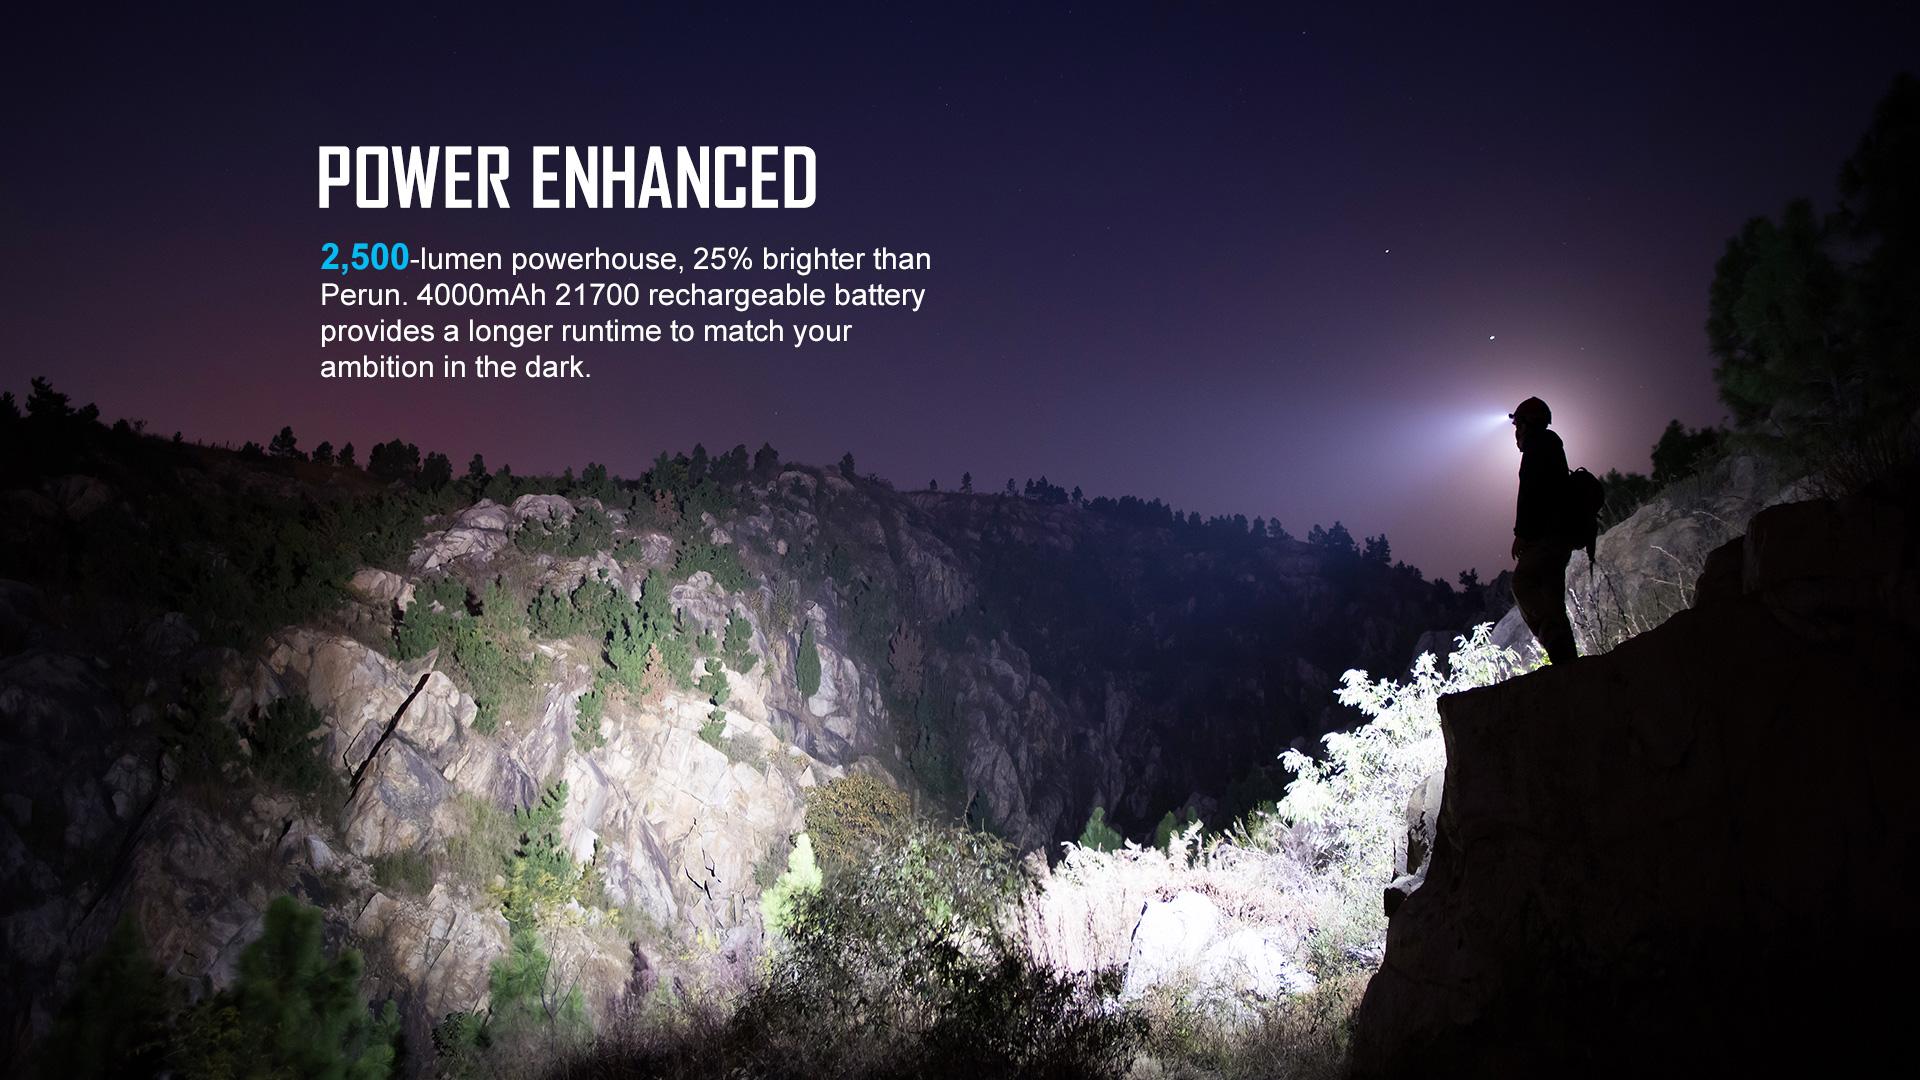 perun 2  Power Enhanced